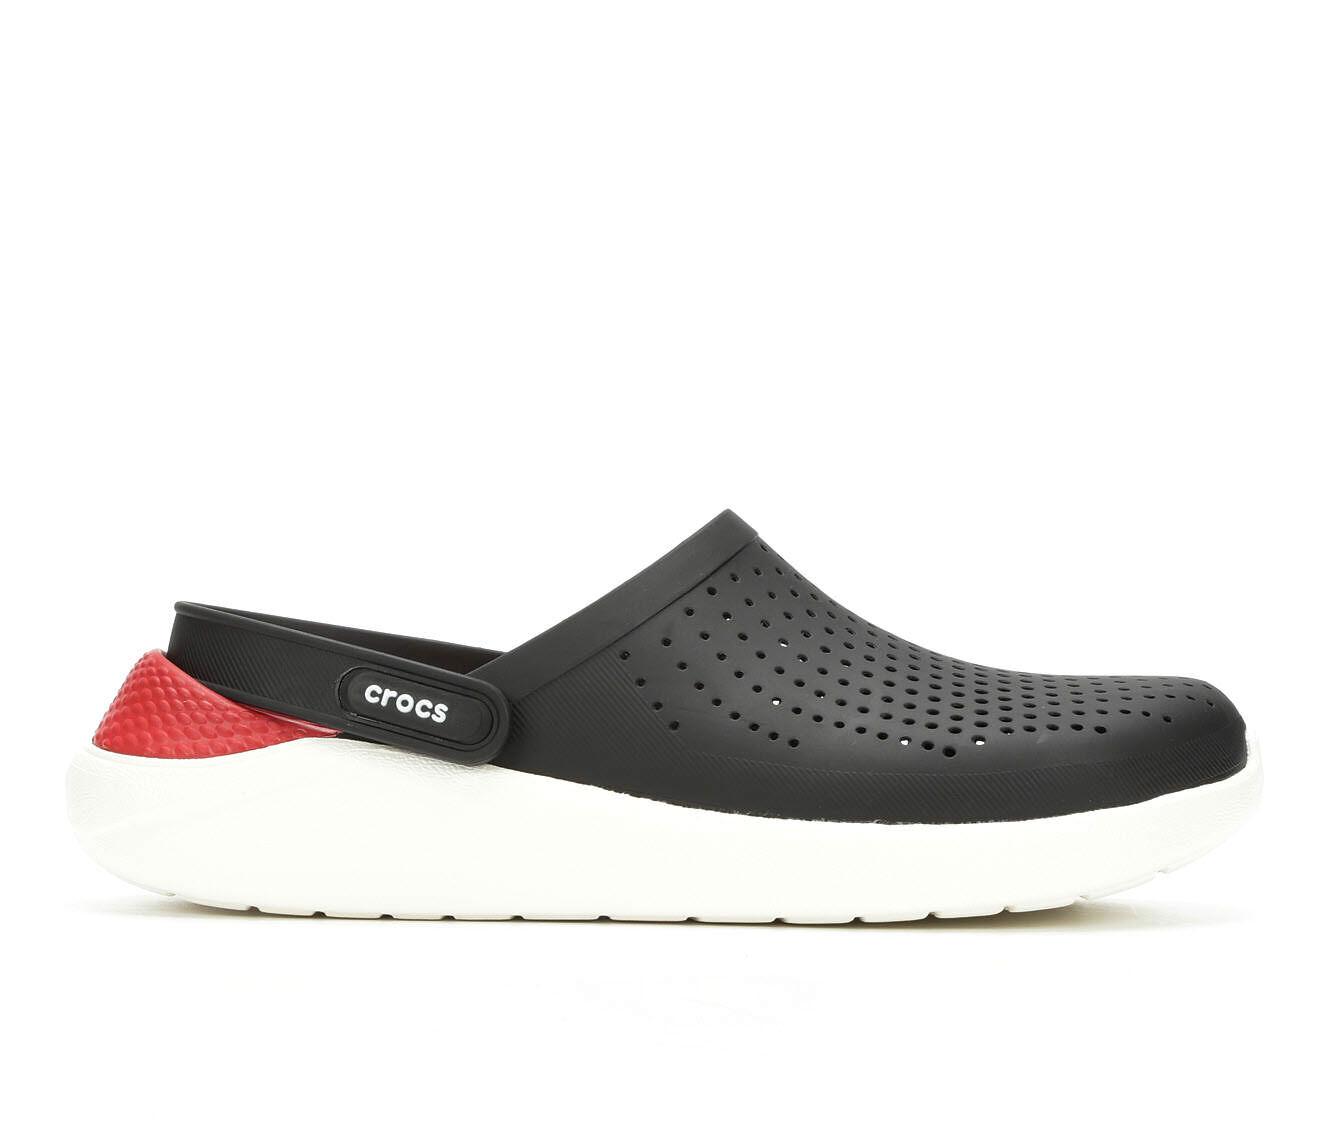 discount authentic Men's Crocs LiteRide Clog Black/Red/Wht